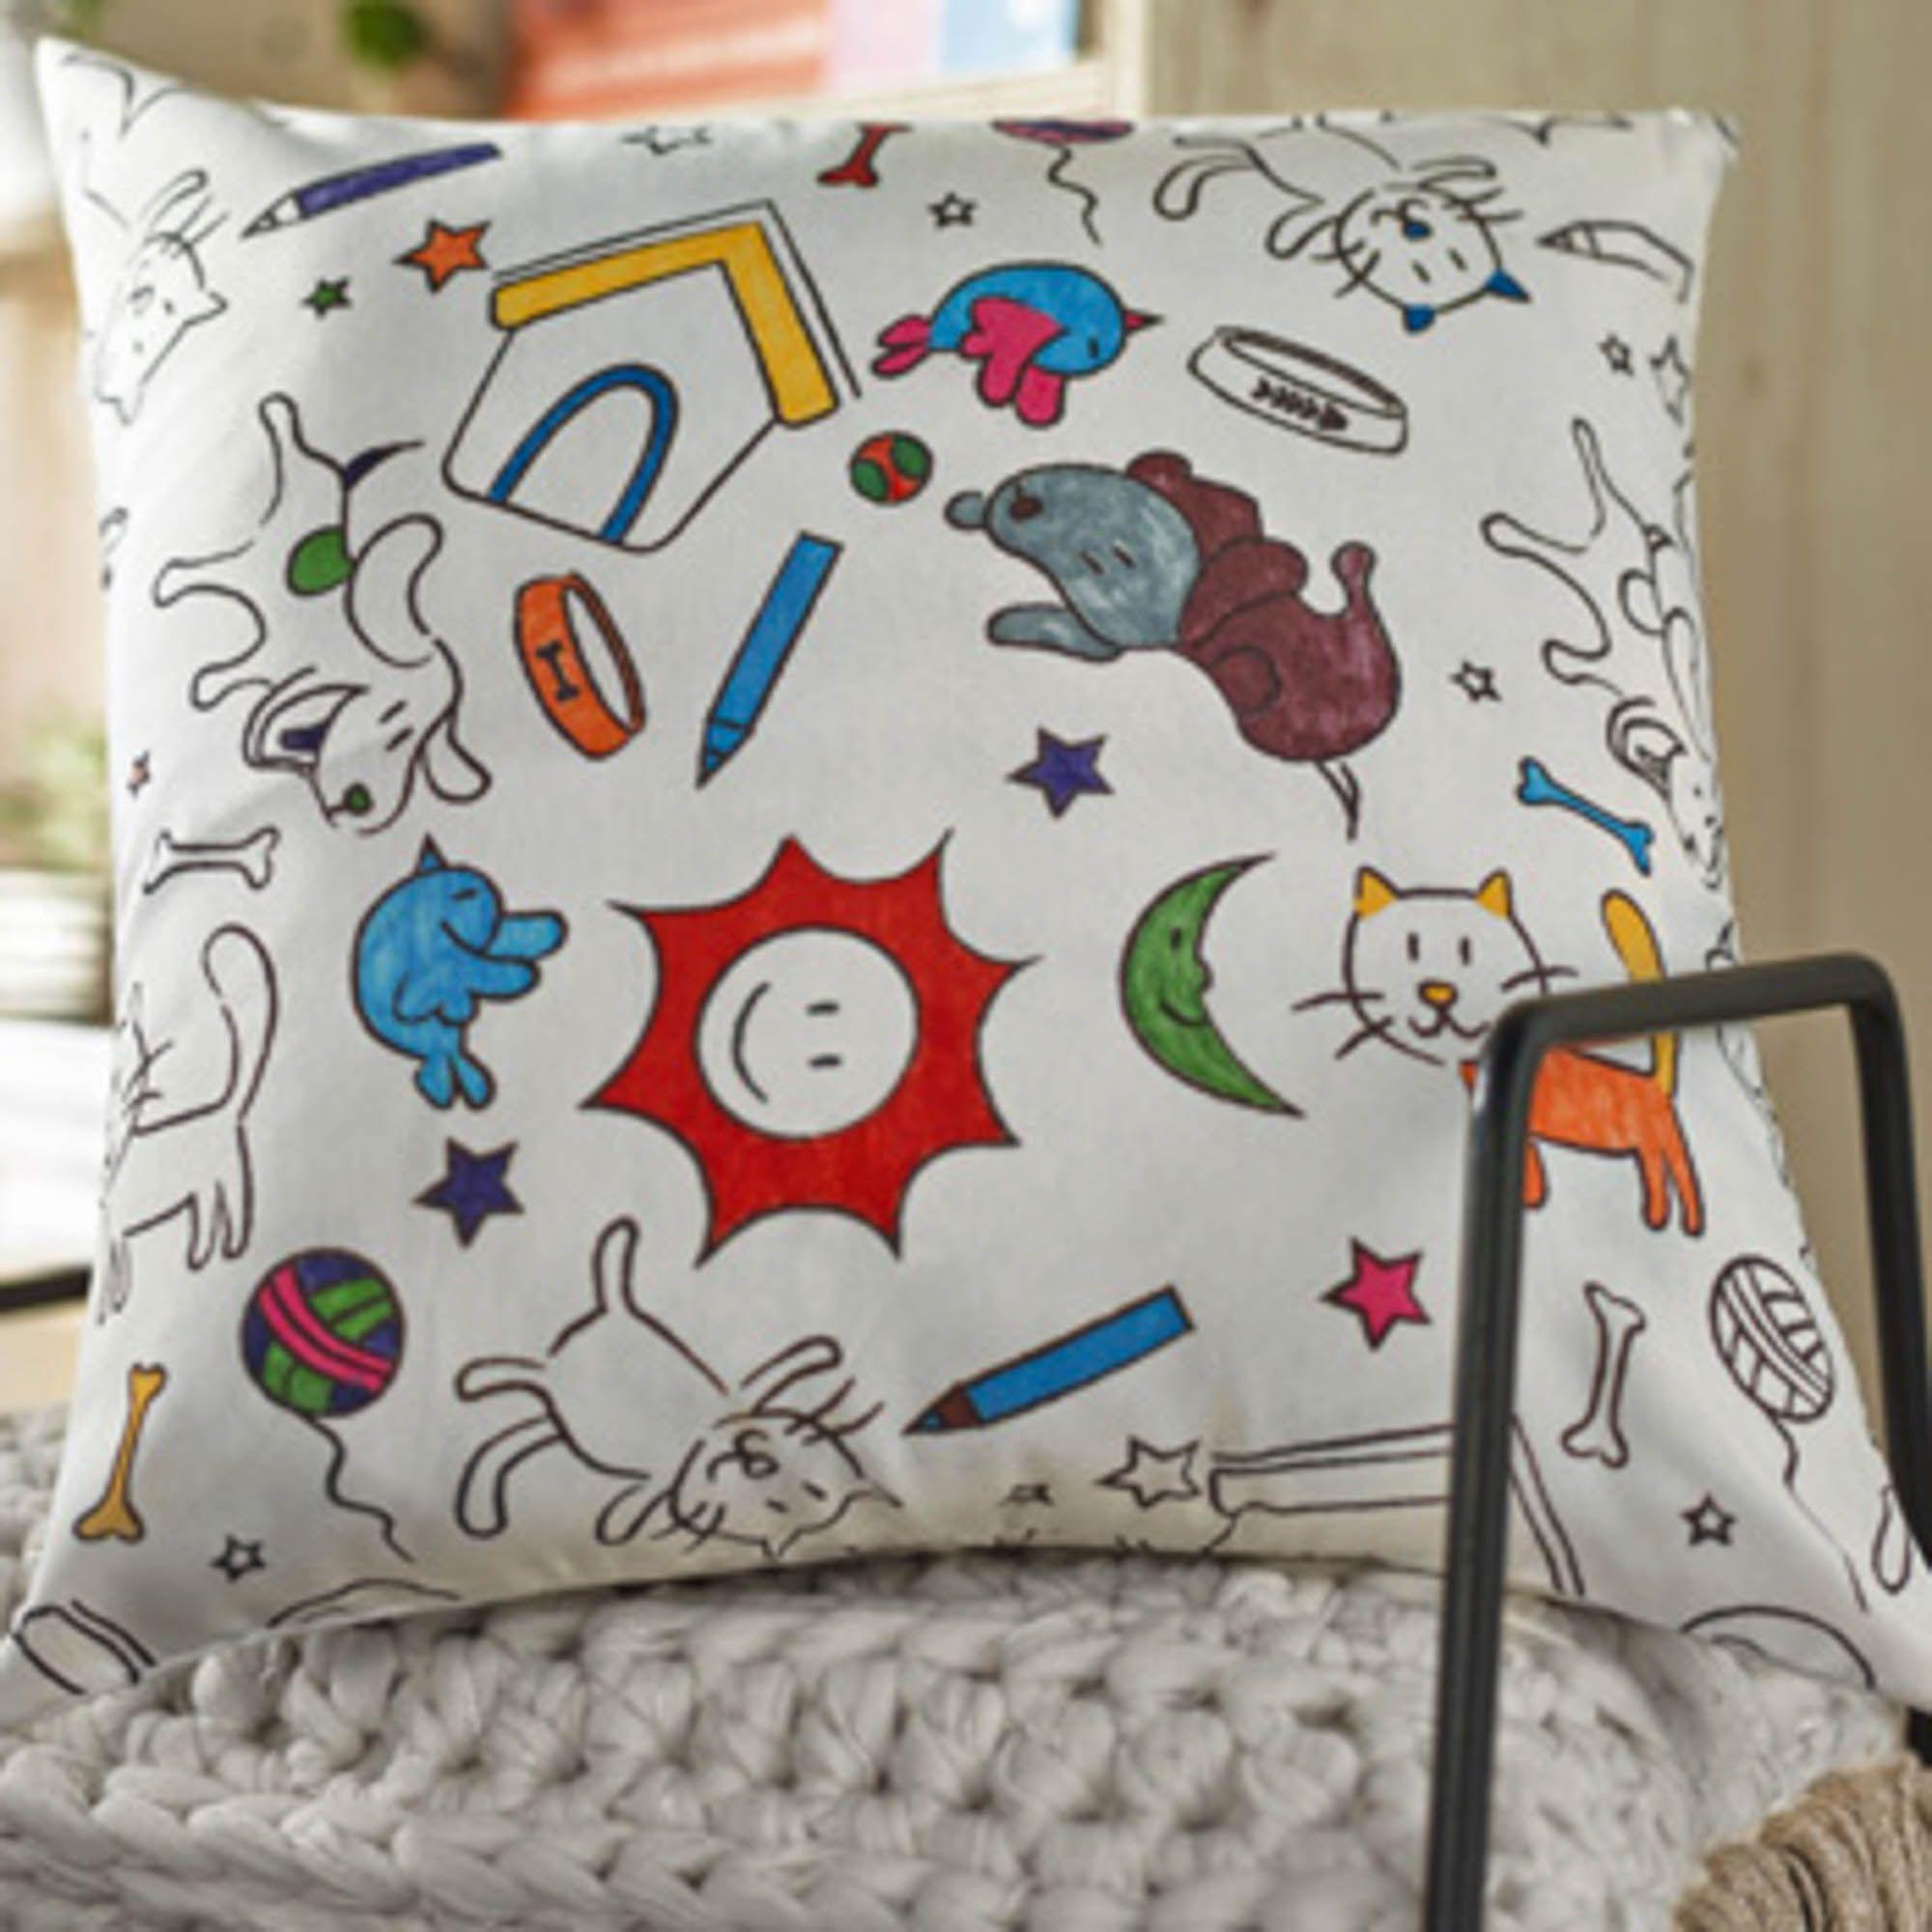 Almofada para colorir santista infantil 45x45cm colorito